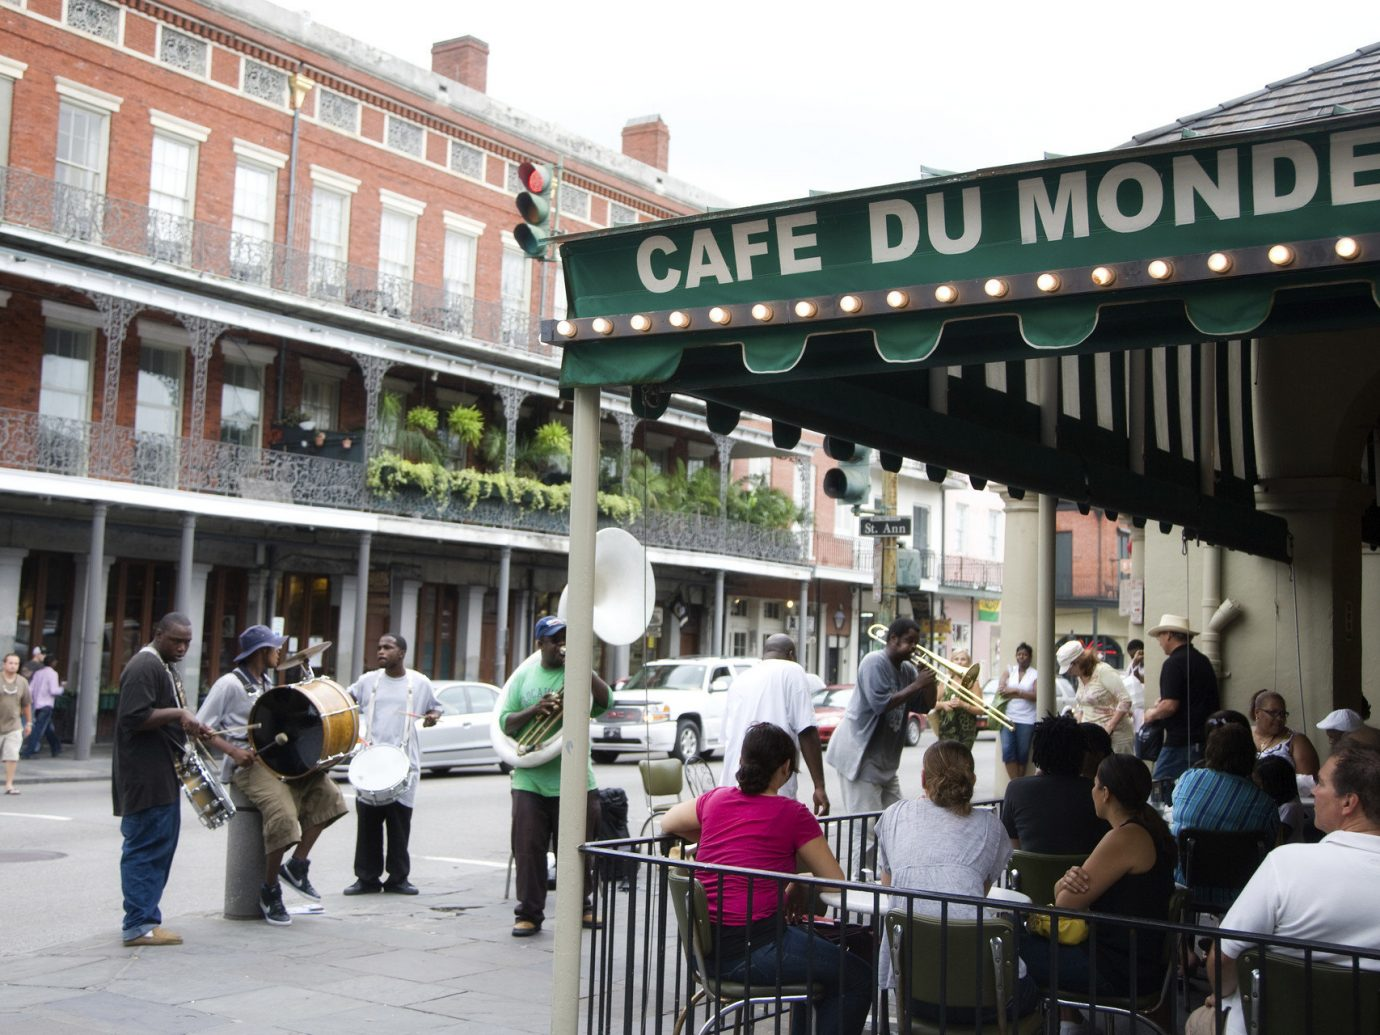 Trip Ideas building outdoor person crowd City tourism restaurant travel